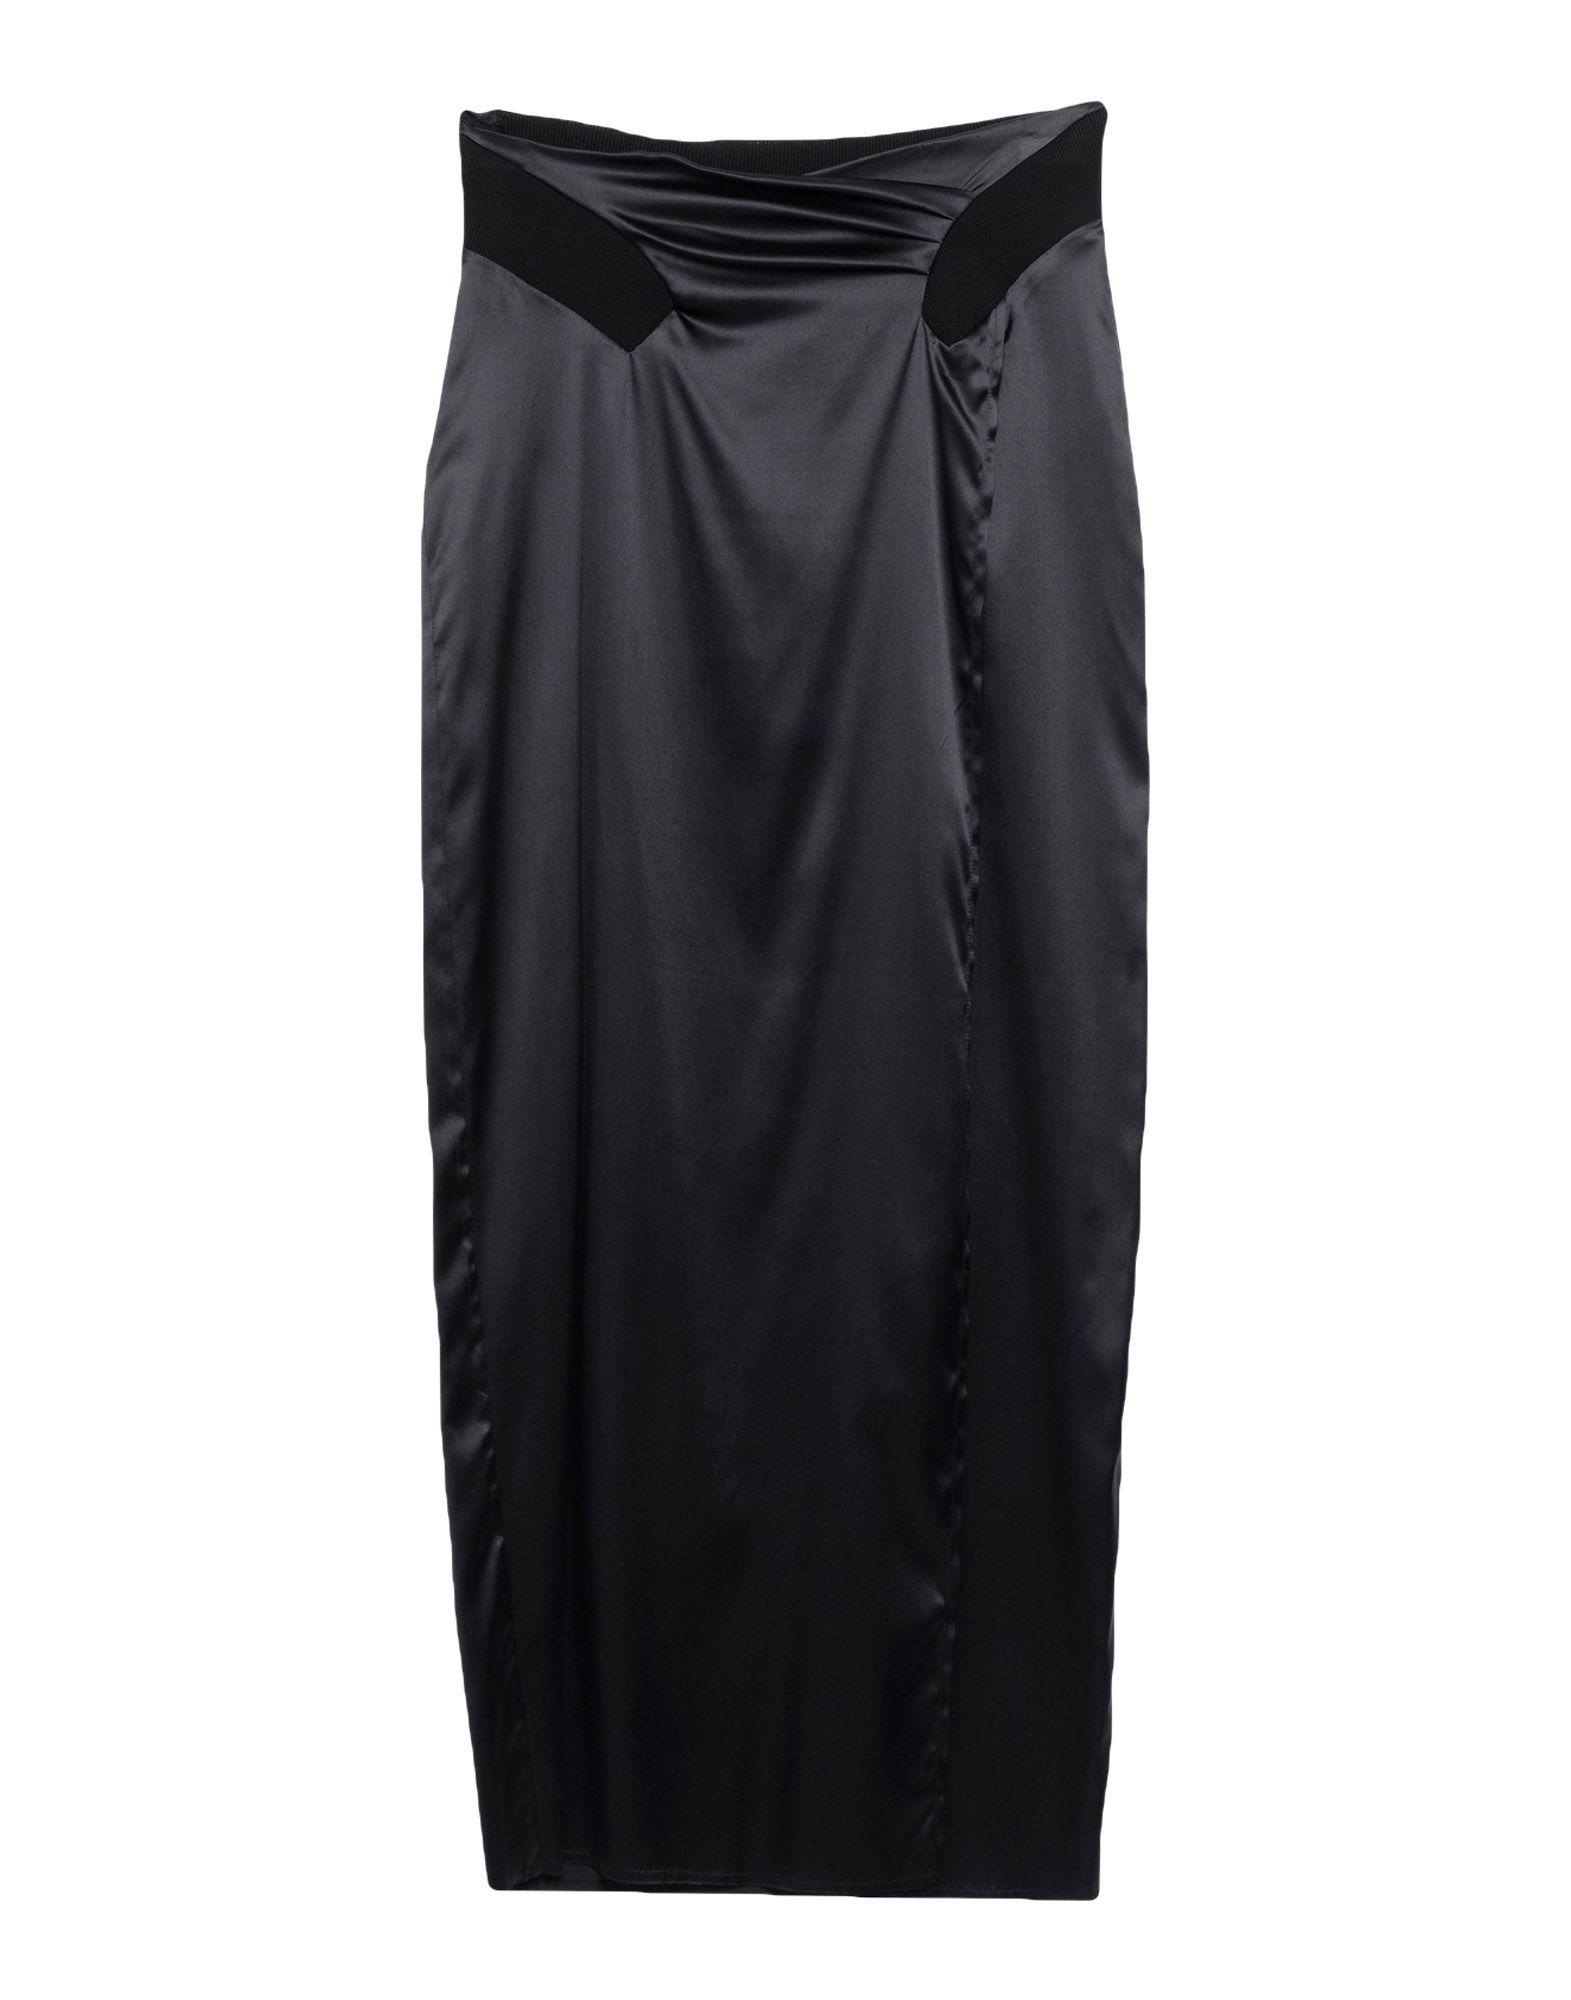 FRANCESCA PICCINI Длинная юбка юбка francesca piccini юбки мини короткие